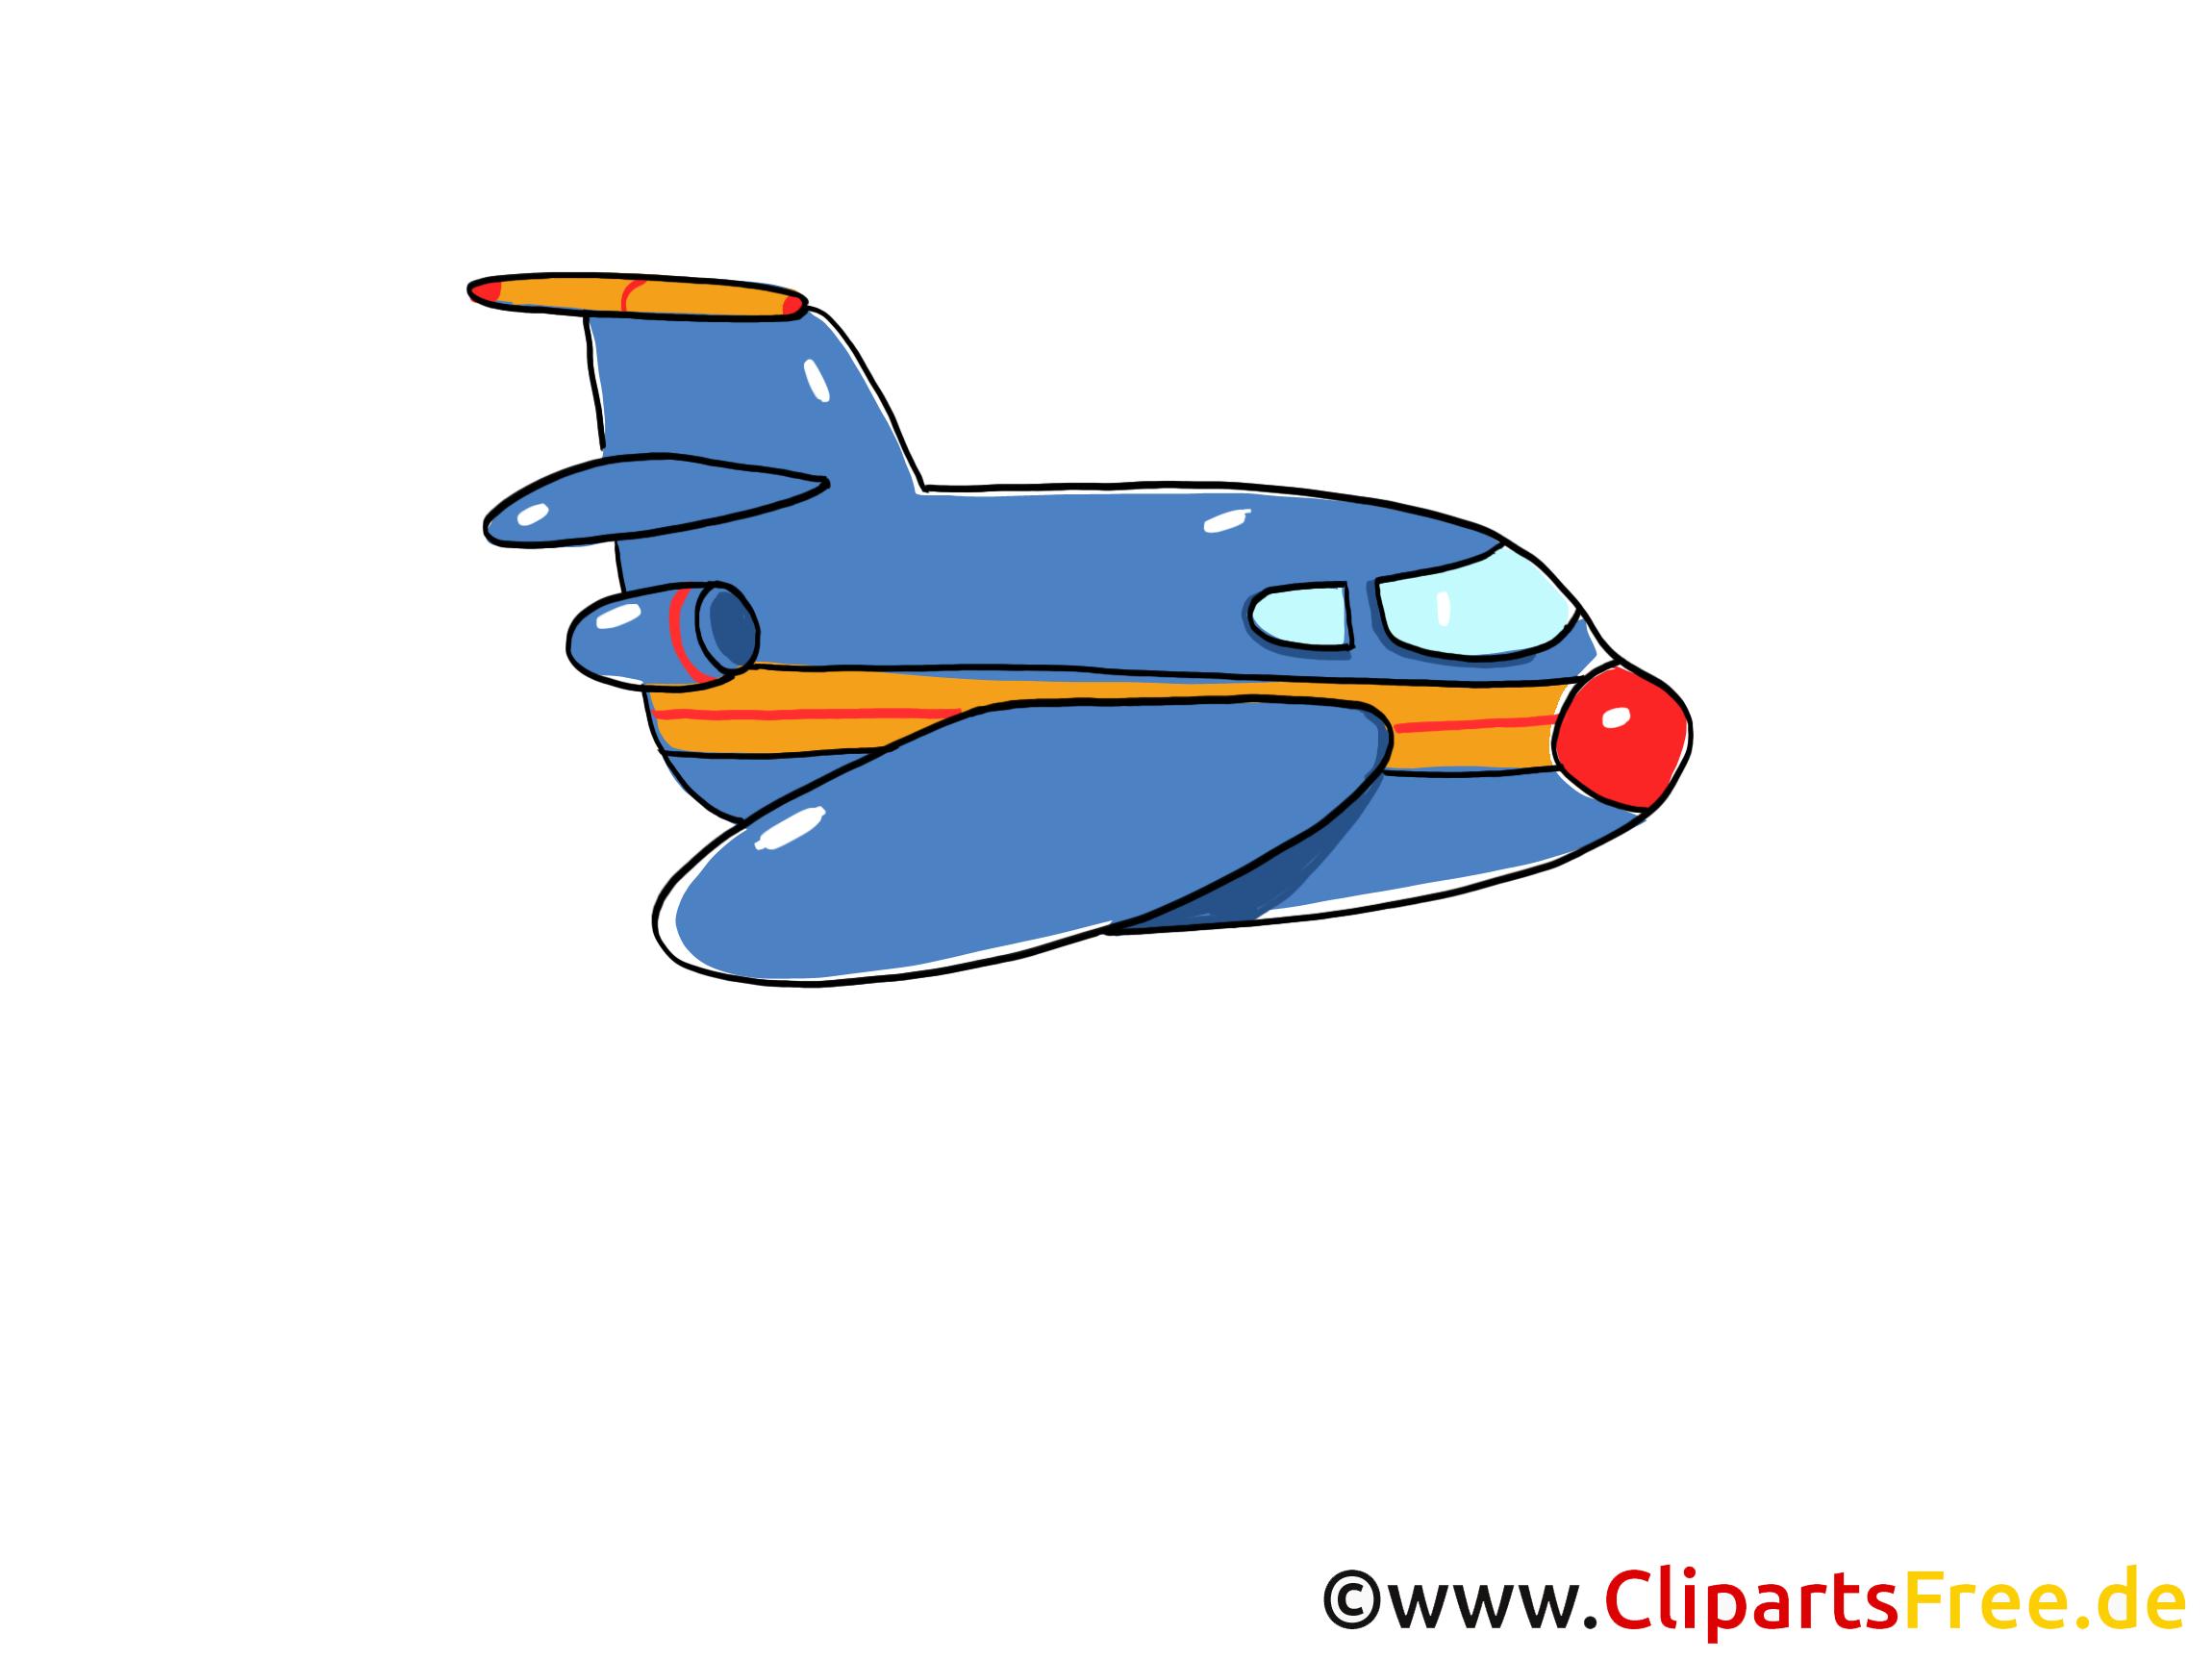 Duesenflugzeug, Duesenjet und Jet Clipart, Bild, Cartoon, Comic, Grafik